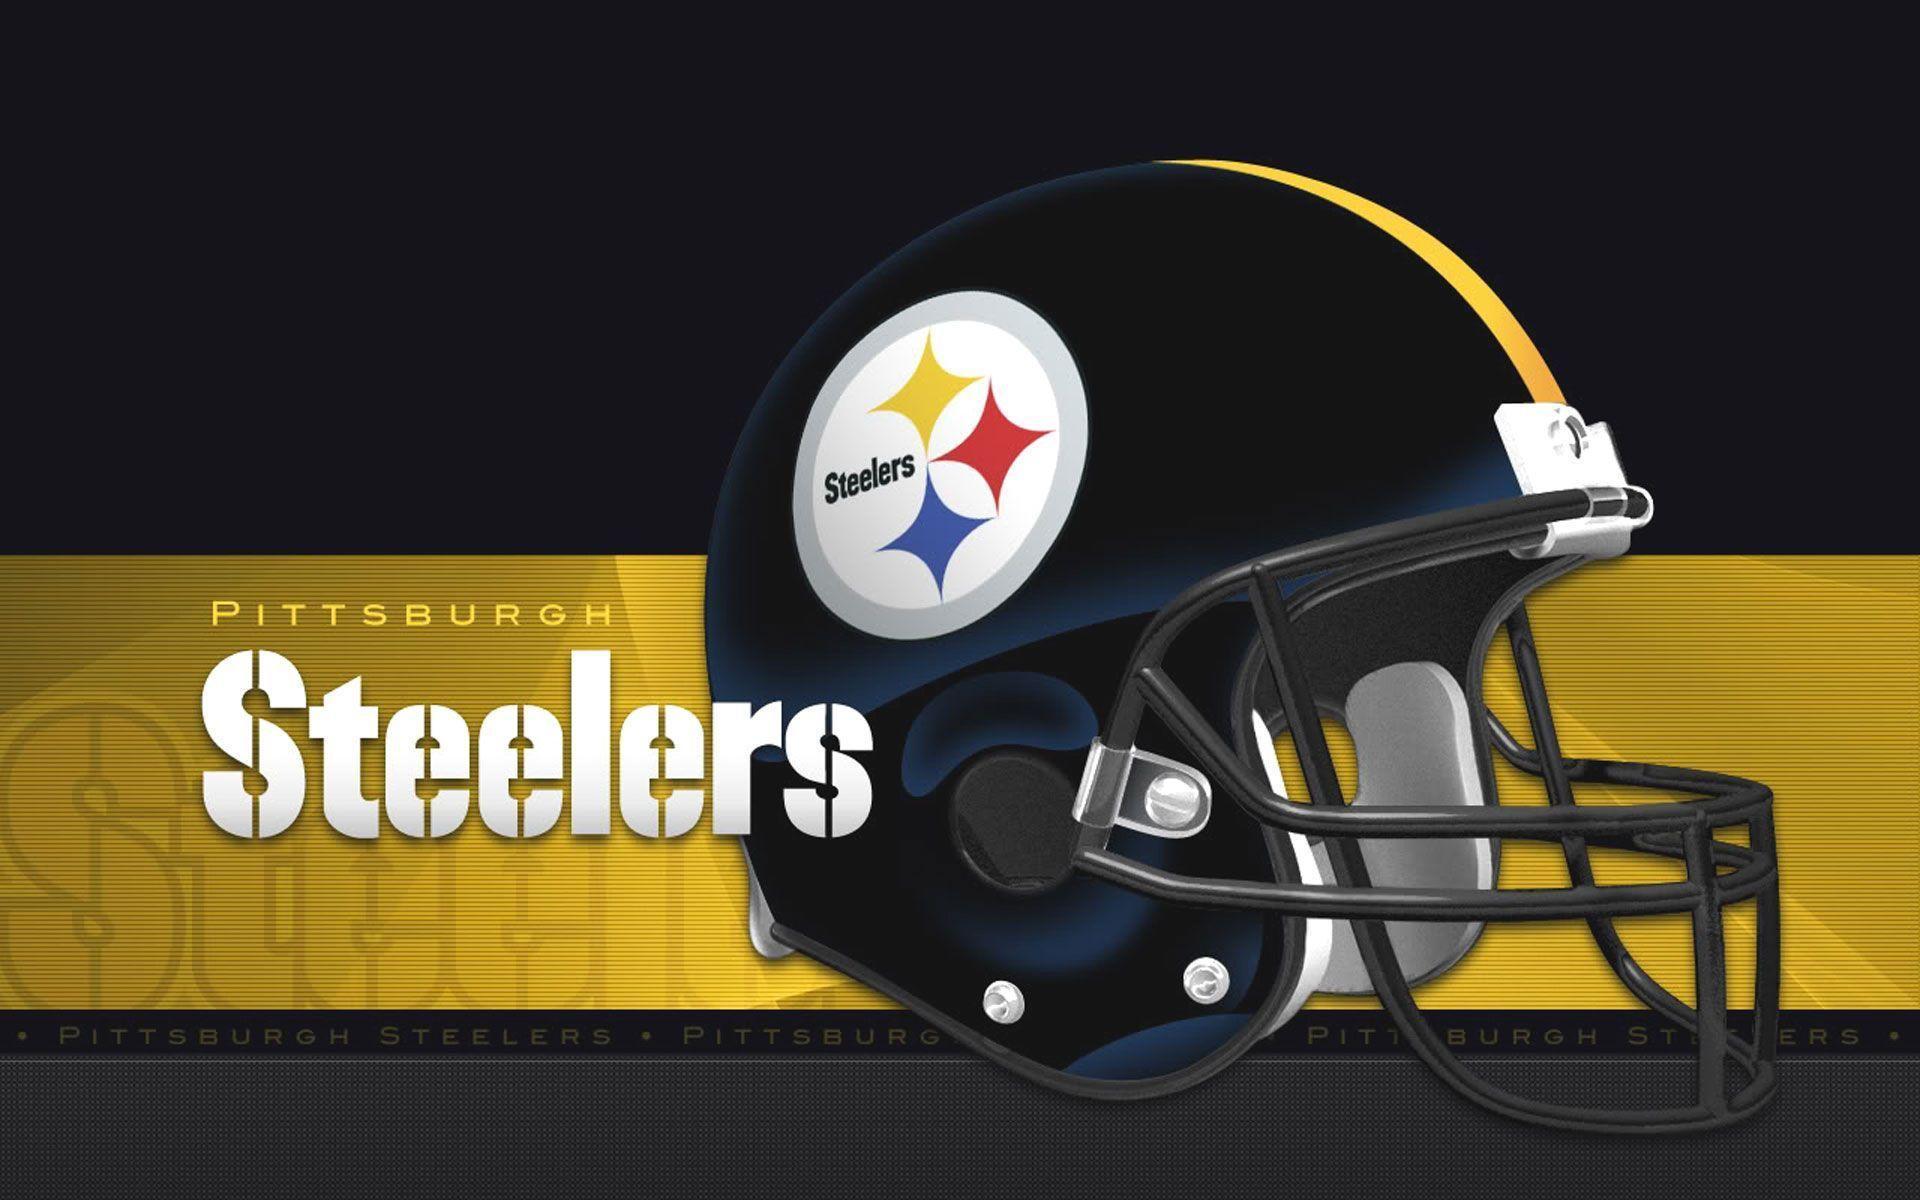 Steelers Logo HD Images #694) wallpaper - wallucky.